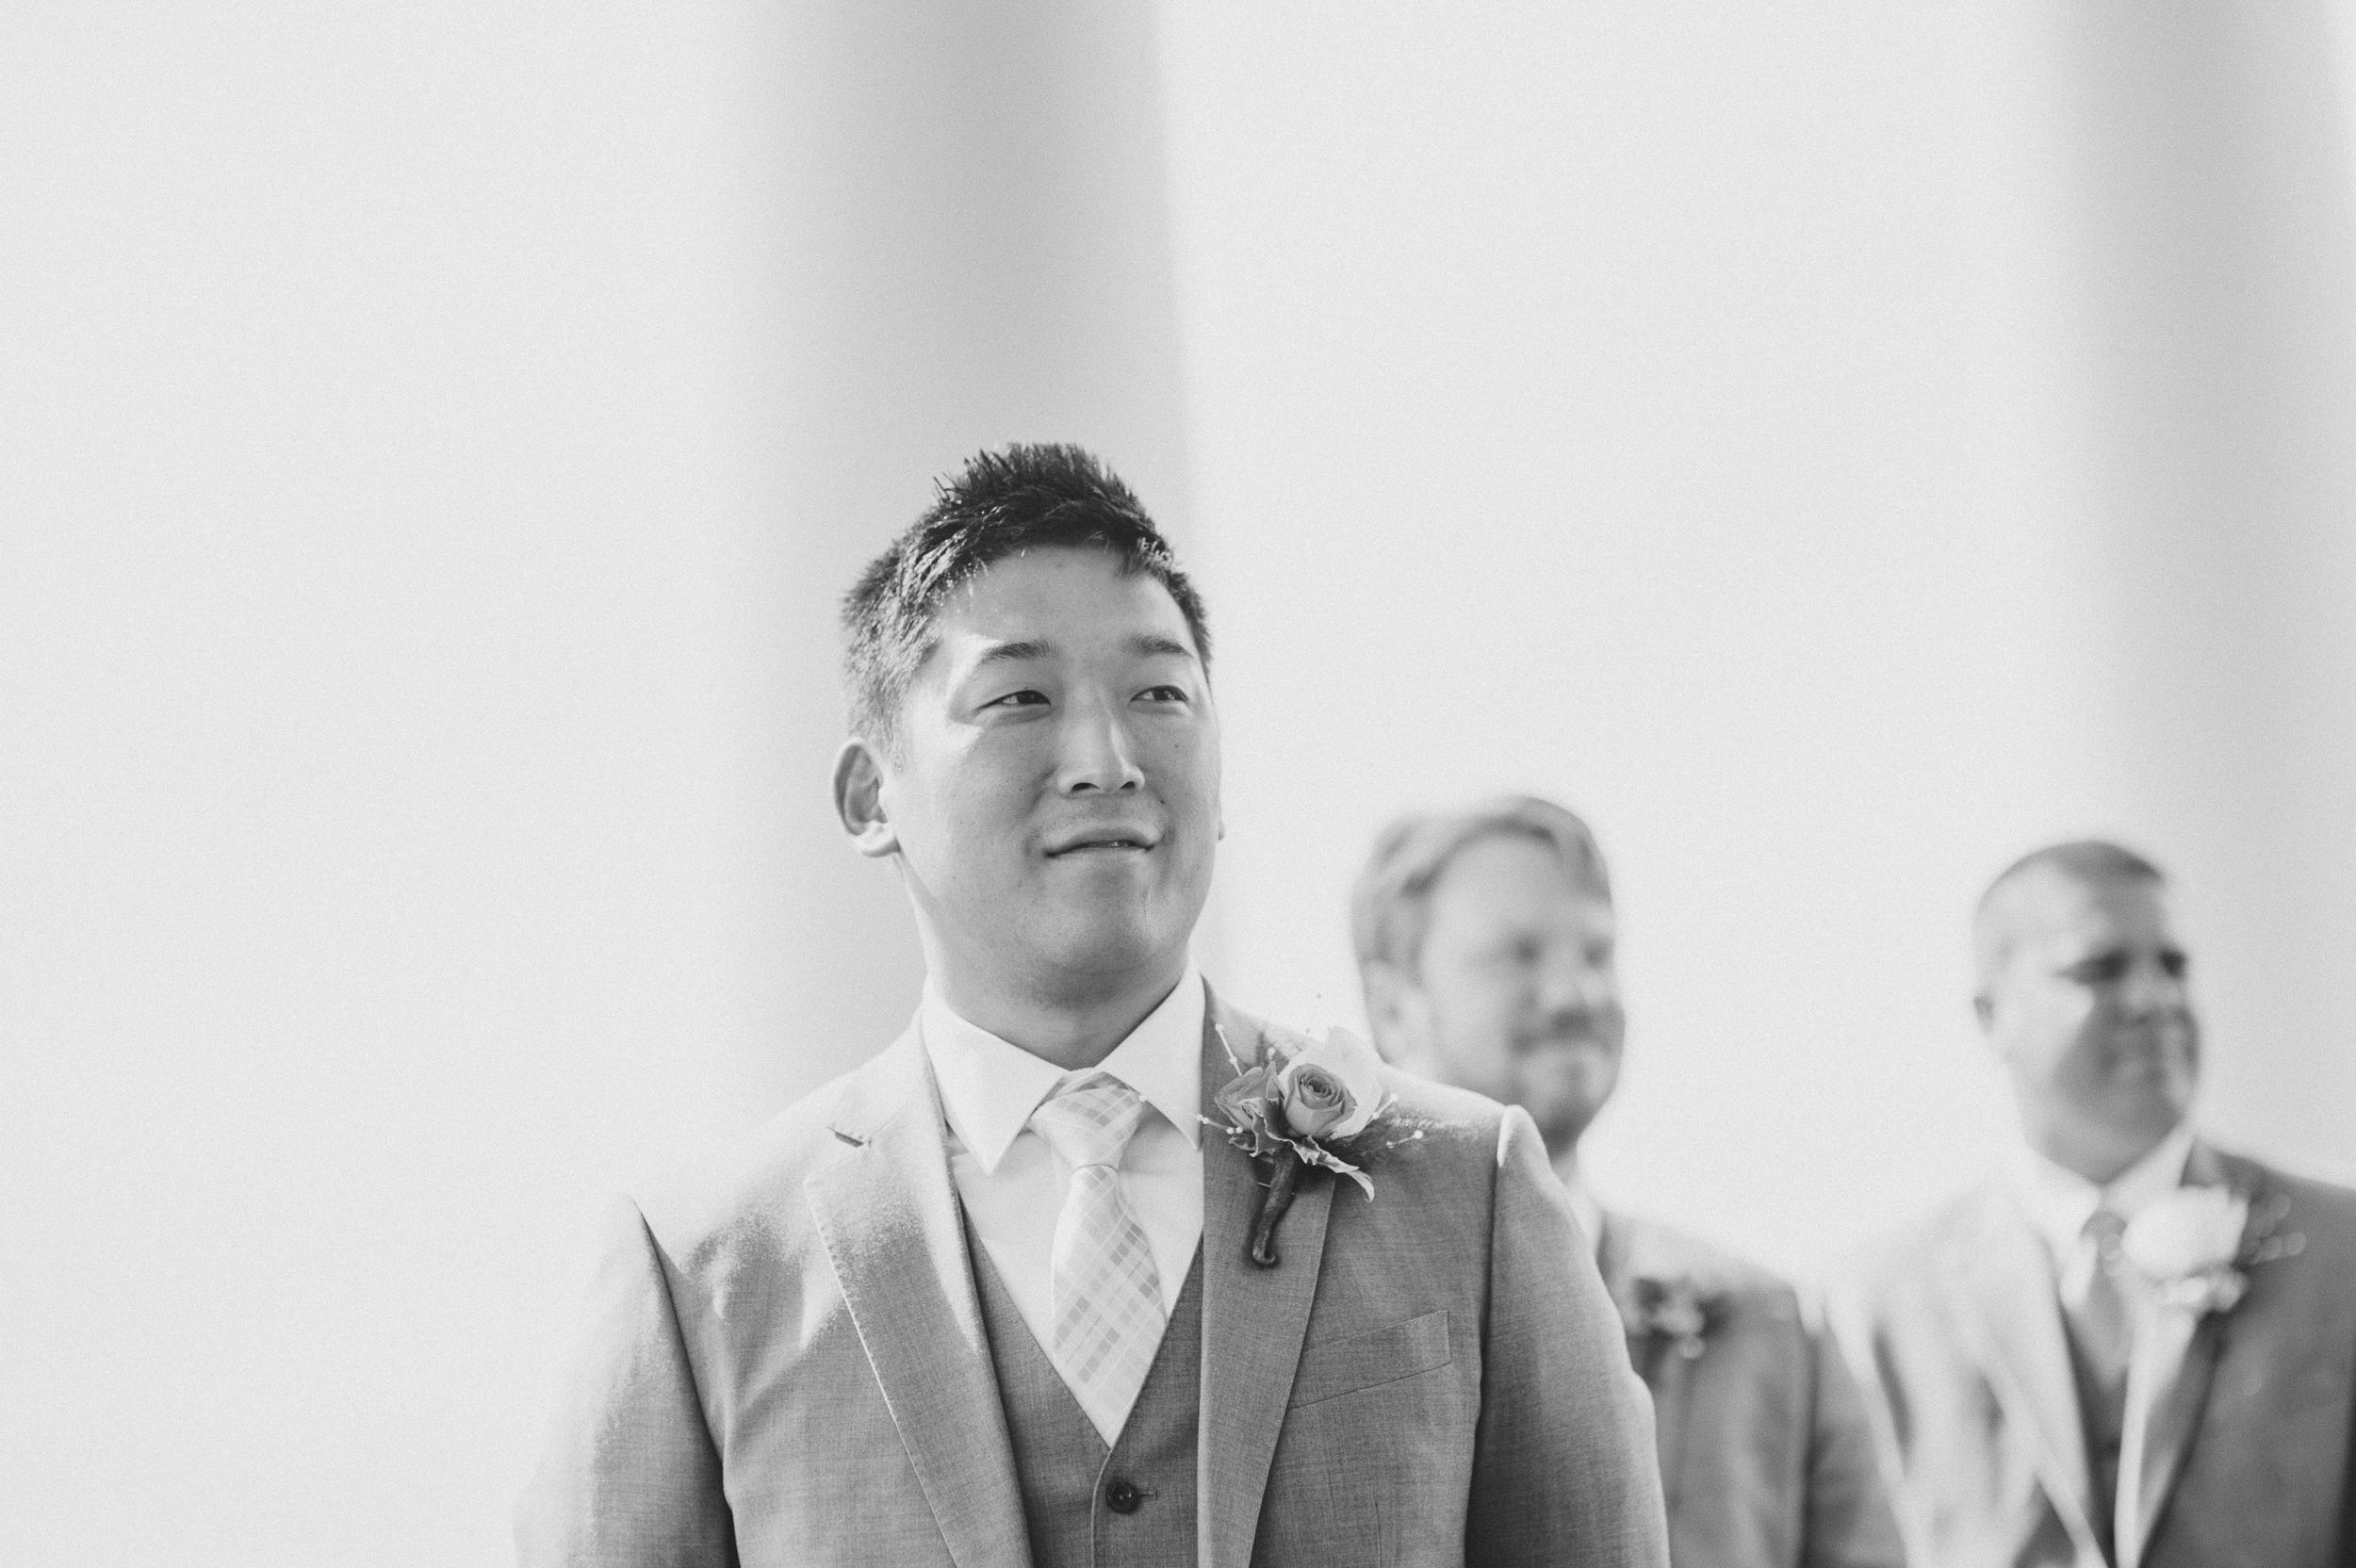 union-trust-philadelphia-wedding-photographer-37.jpg